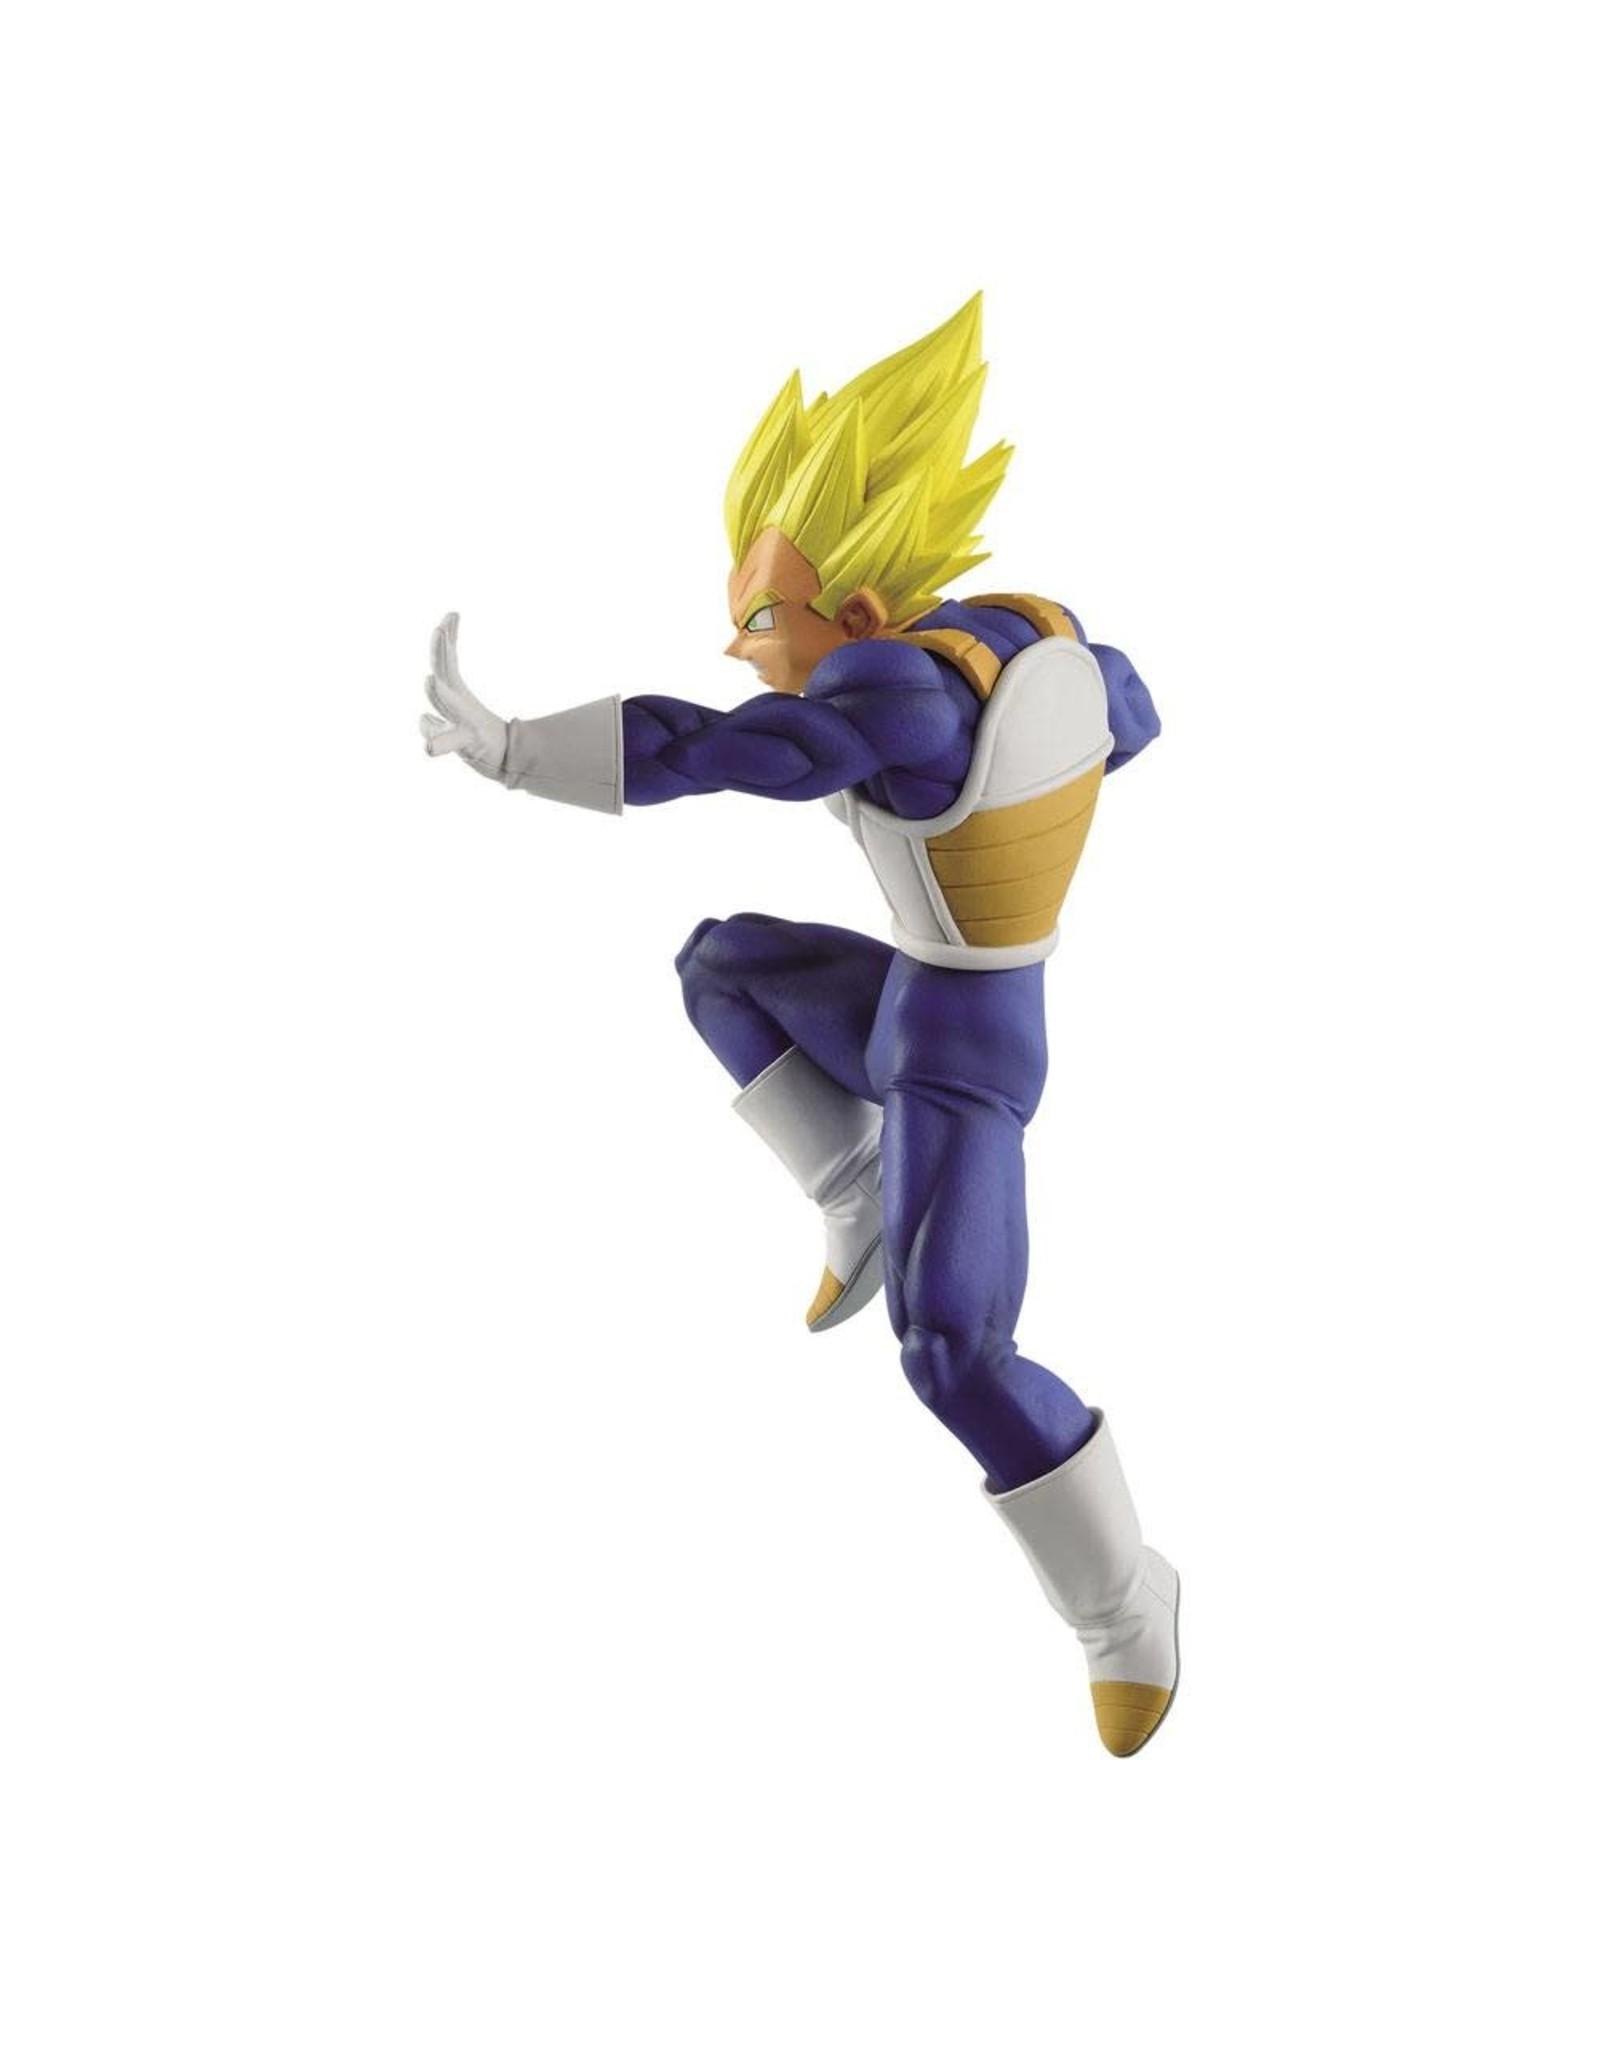 Dragon Ball Super Chosenshiretsuden - Super Saiyan Vegeta - PVC Statue - 14 cm